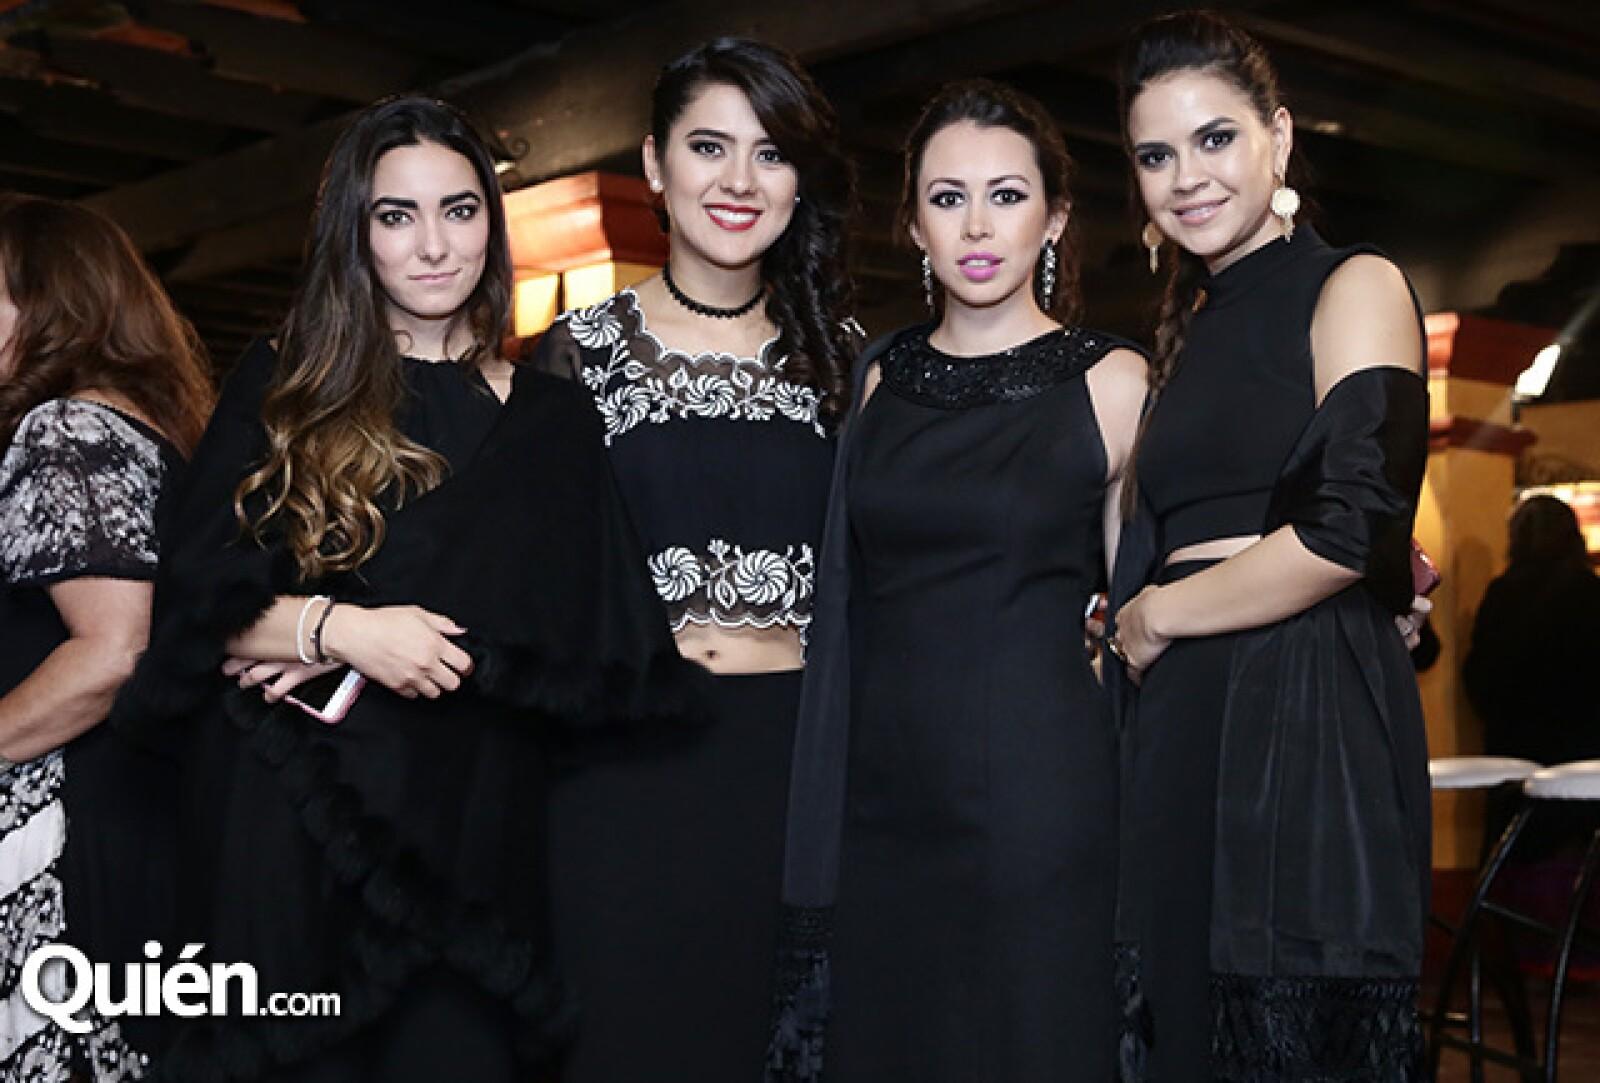 Brianda Pérez Negron, Celina Díaz, Andrea Ransanz y María Bermúdez